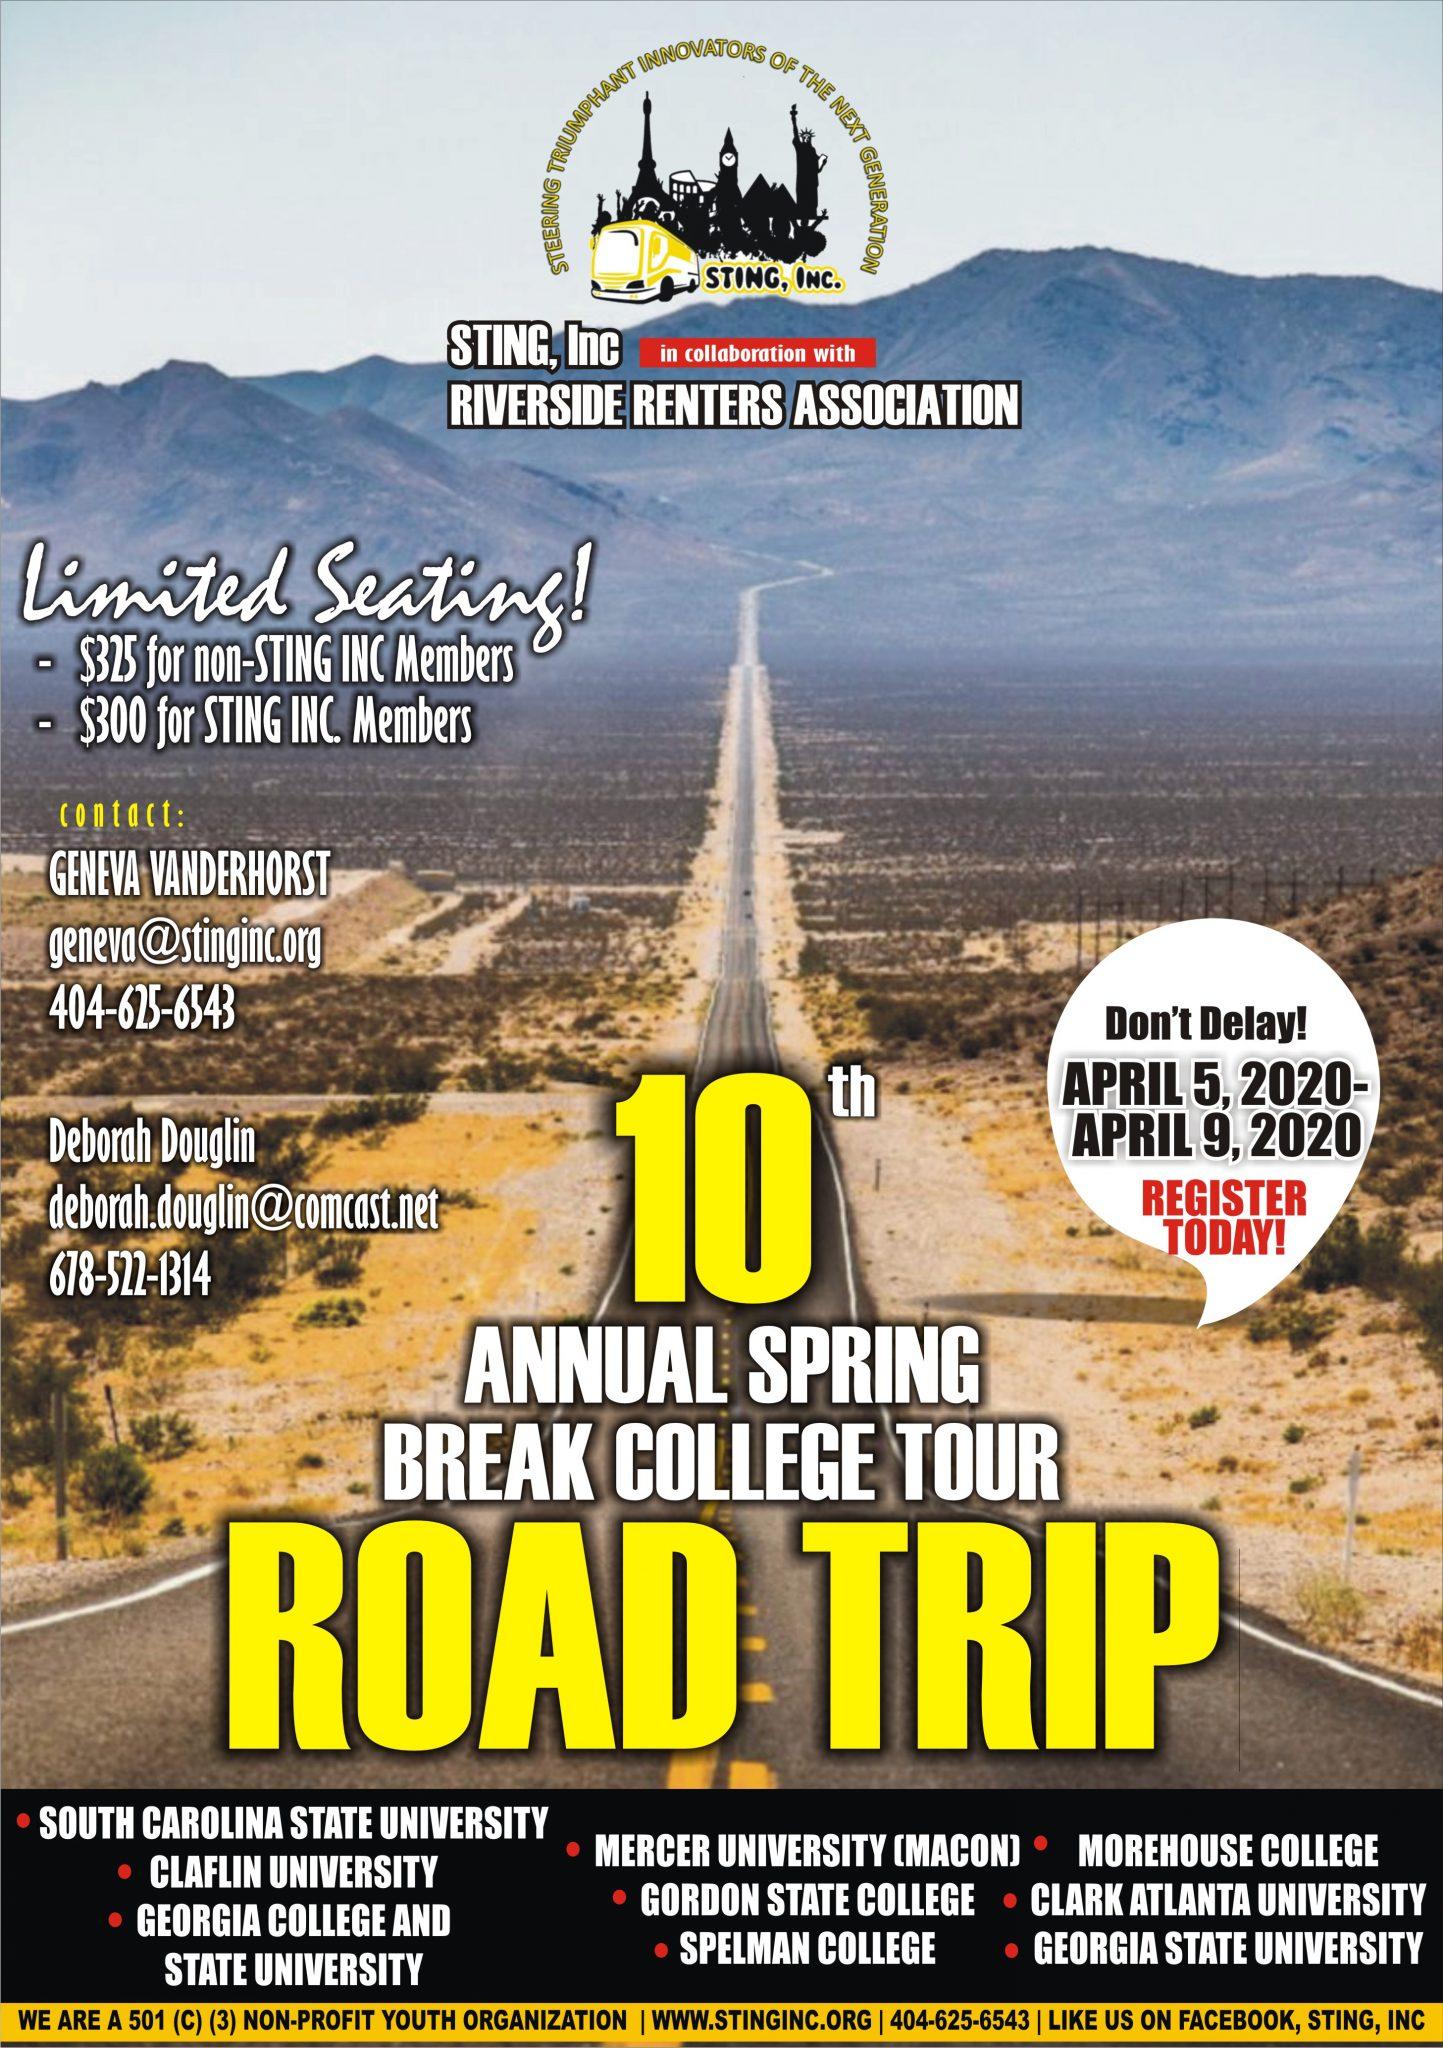 College Road Trip 2020